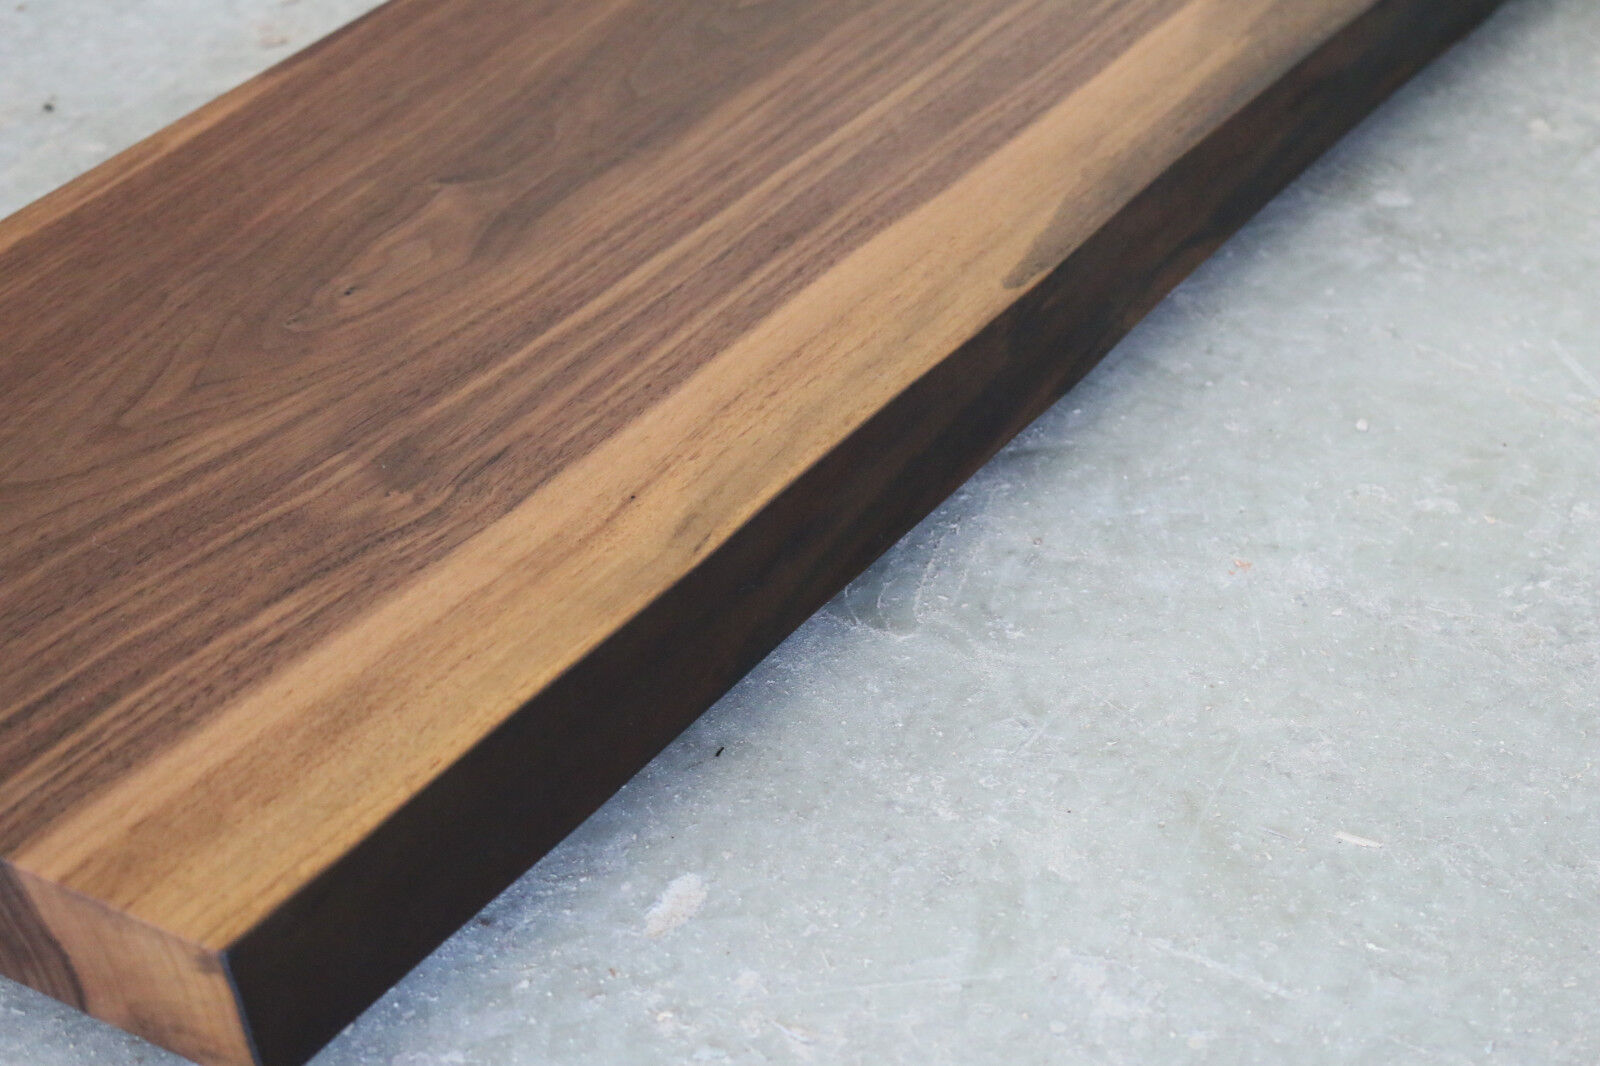 platte nussbaum massiv holz mit baumkante leimholz. Black Bedroom Furniture Sets. Home Design Ideas